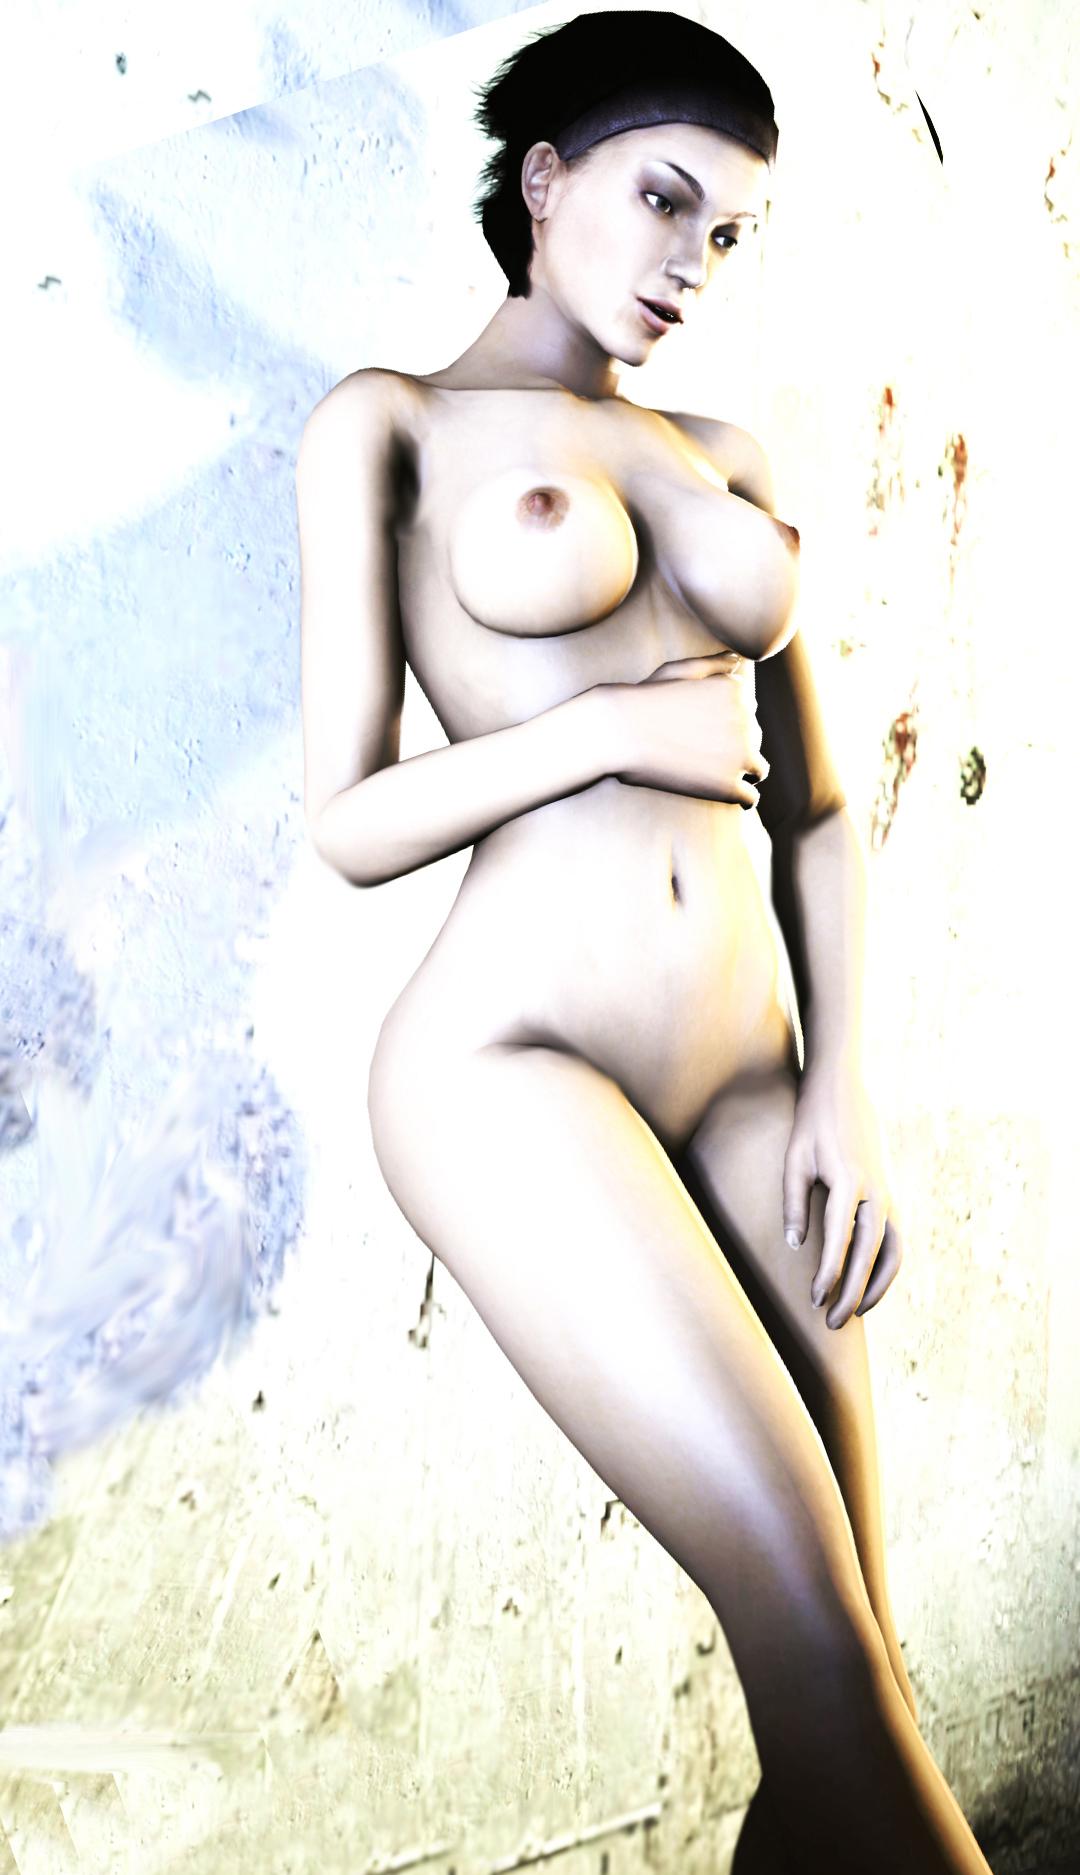 Alyx vance half life porn 3d erotic clips